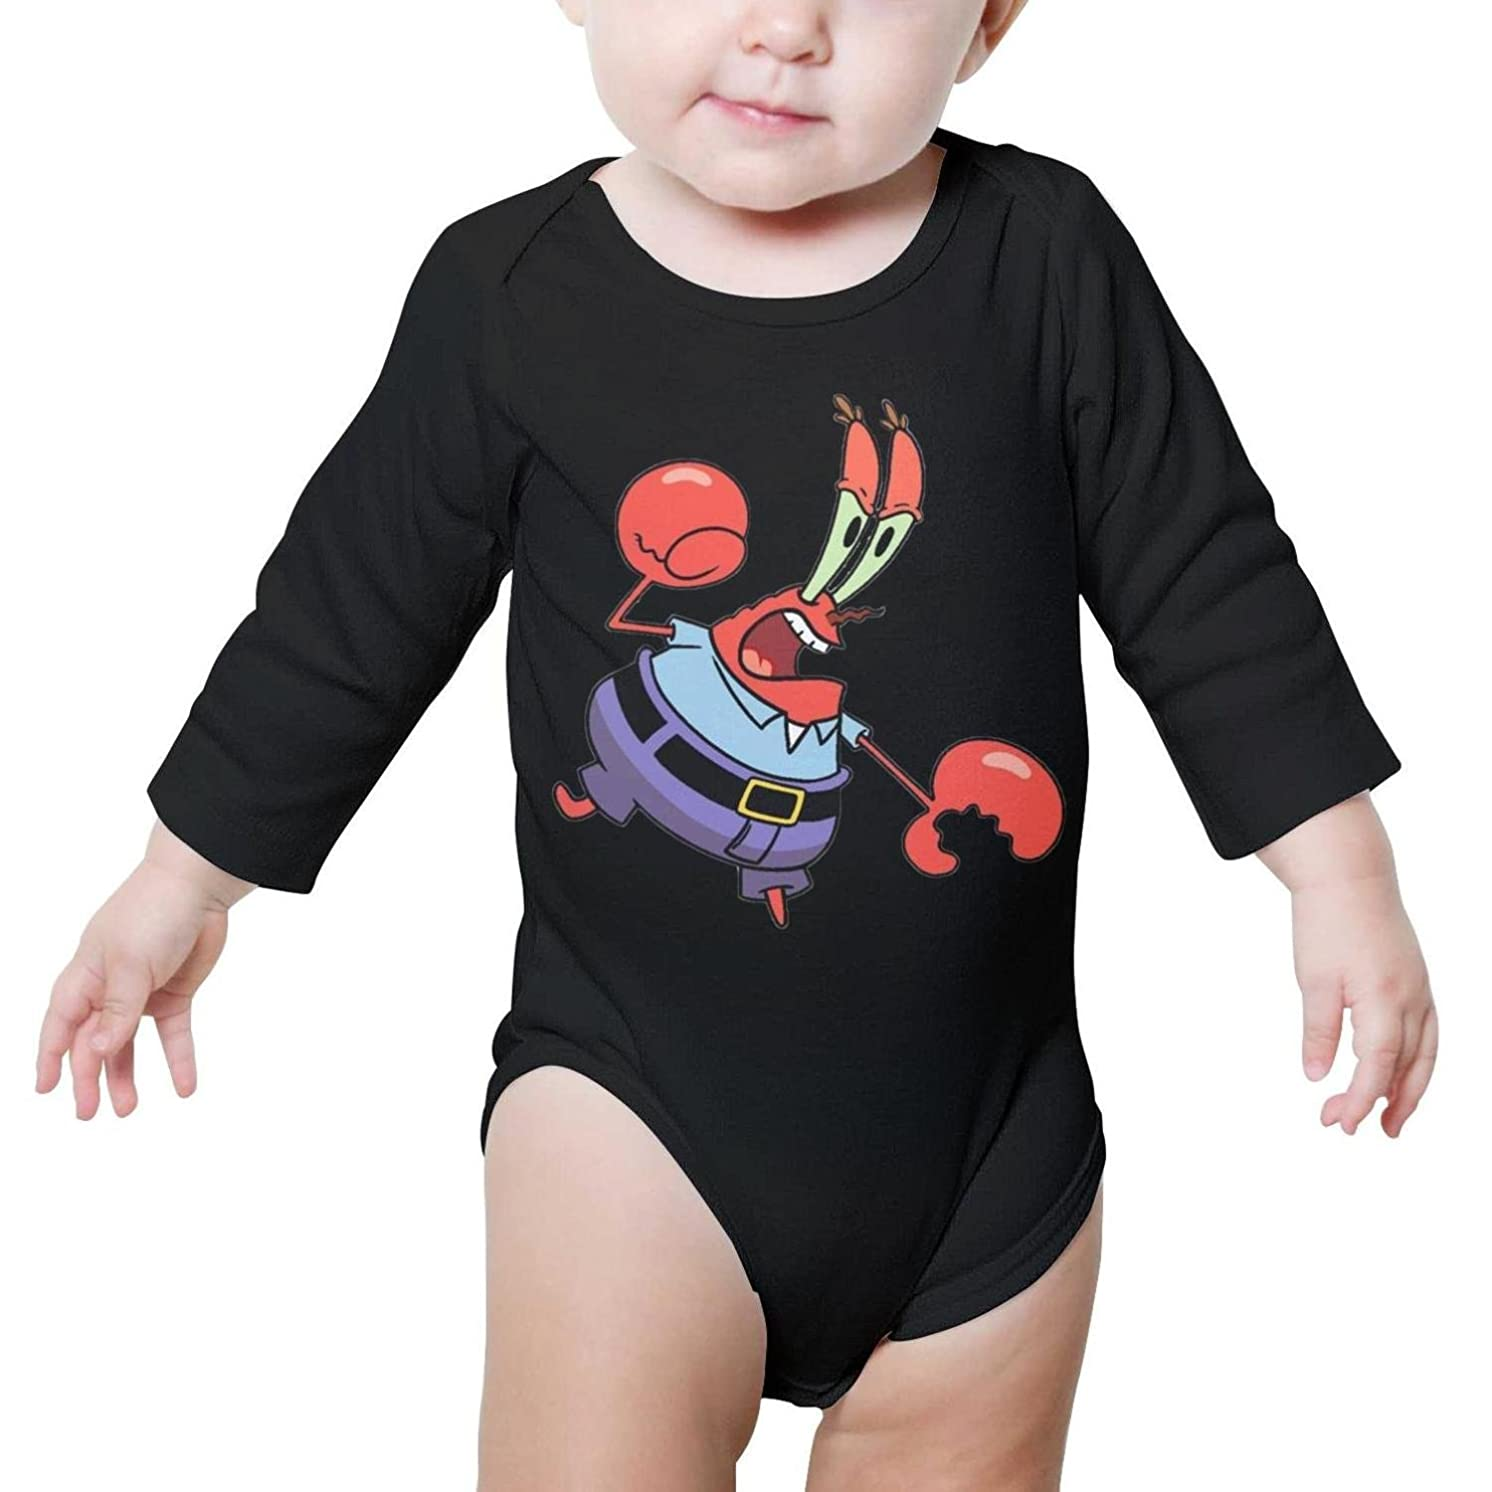 Crab Costume Crab Legs Baby Girl Black Romper Organic Cotton Long Sleeve Unisex